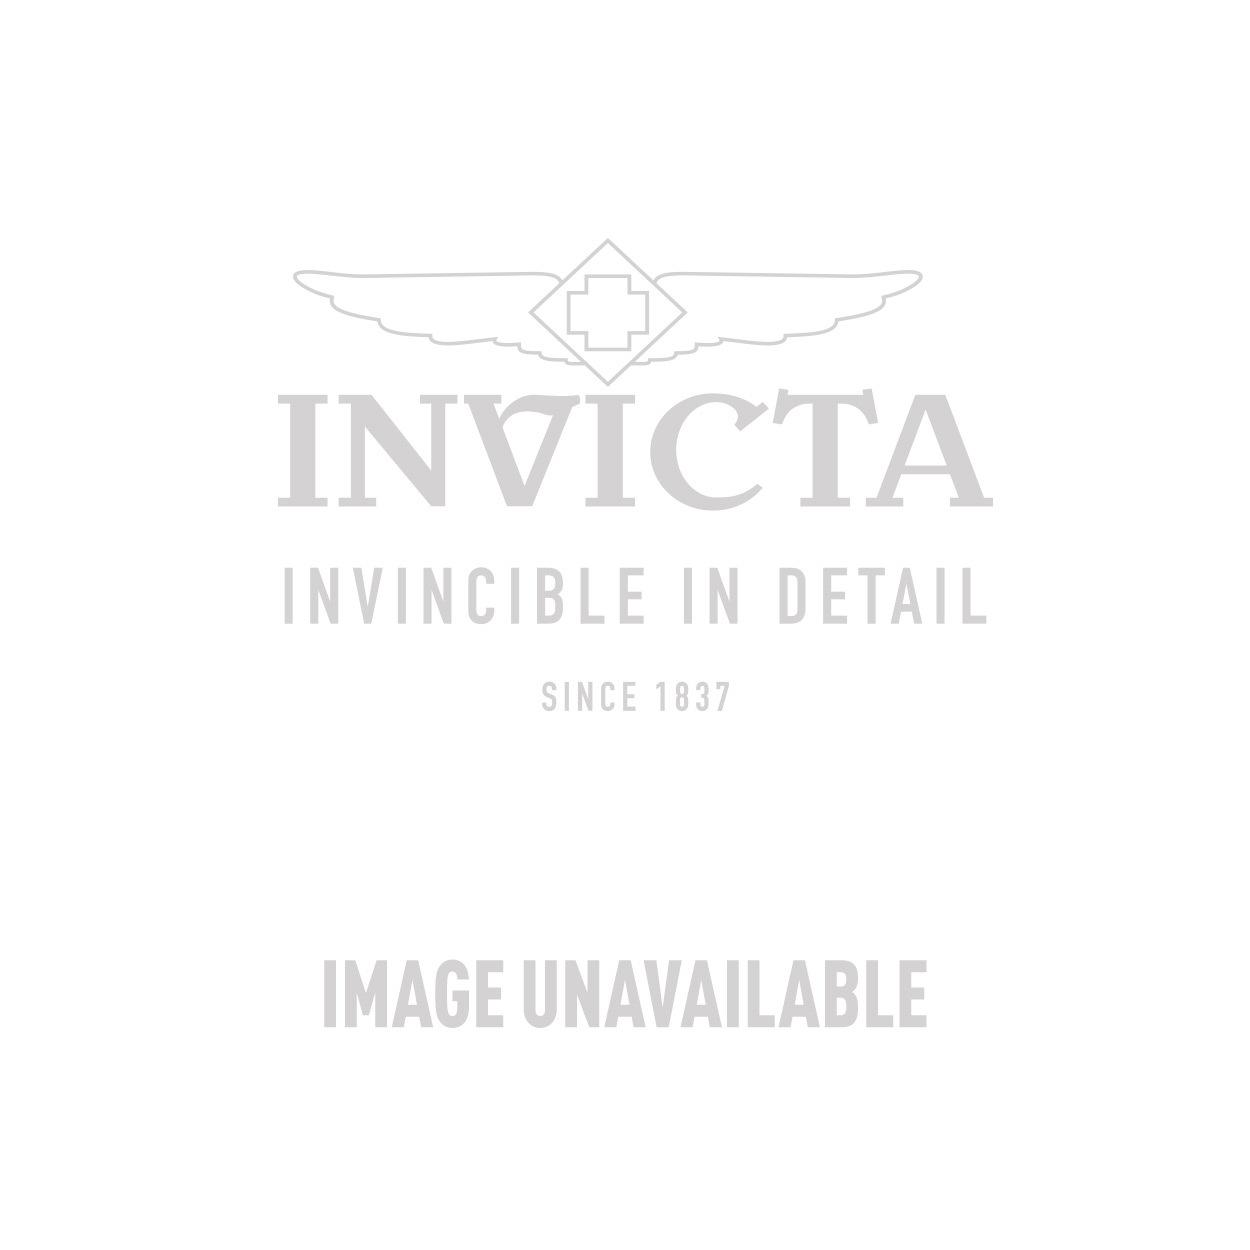 Men Watches - Invicta Reserve Quartz Watch - Model 12898 - Invicta Stores